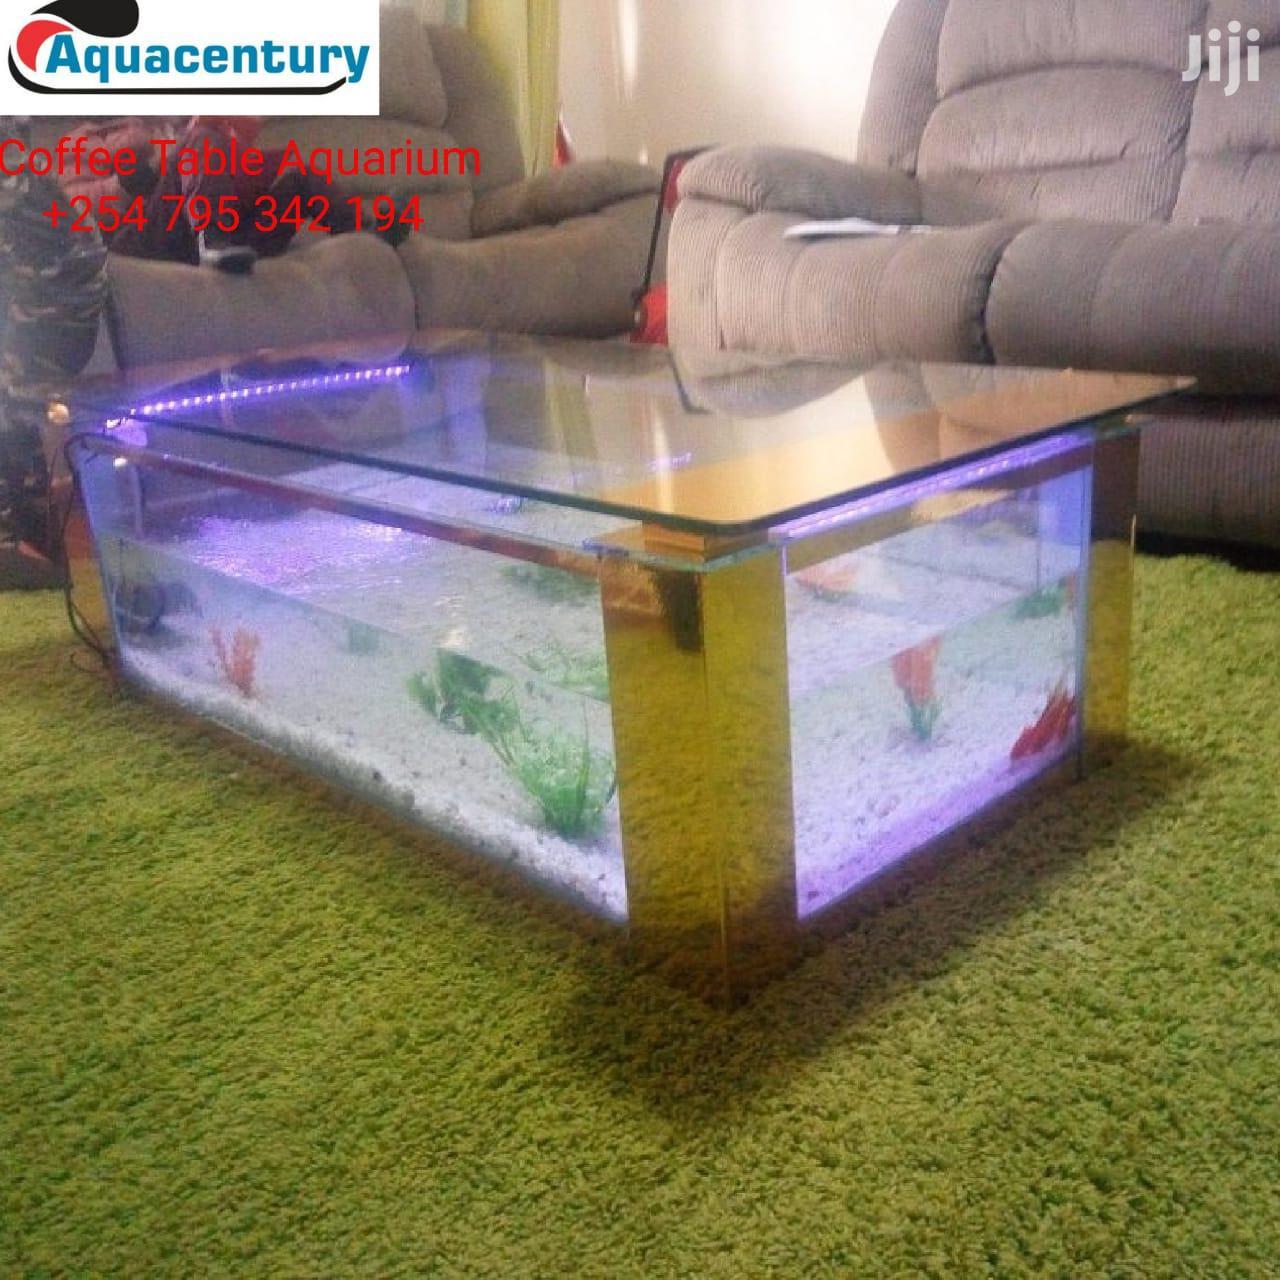 Coffee Table Aquarium   Fish for sale in Kasarani, Nairobi, Kenya